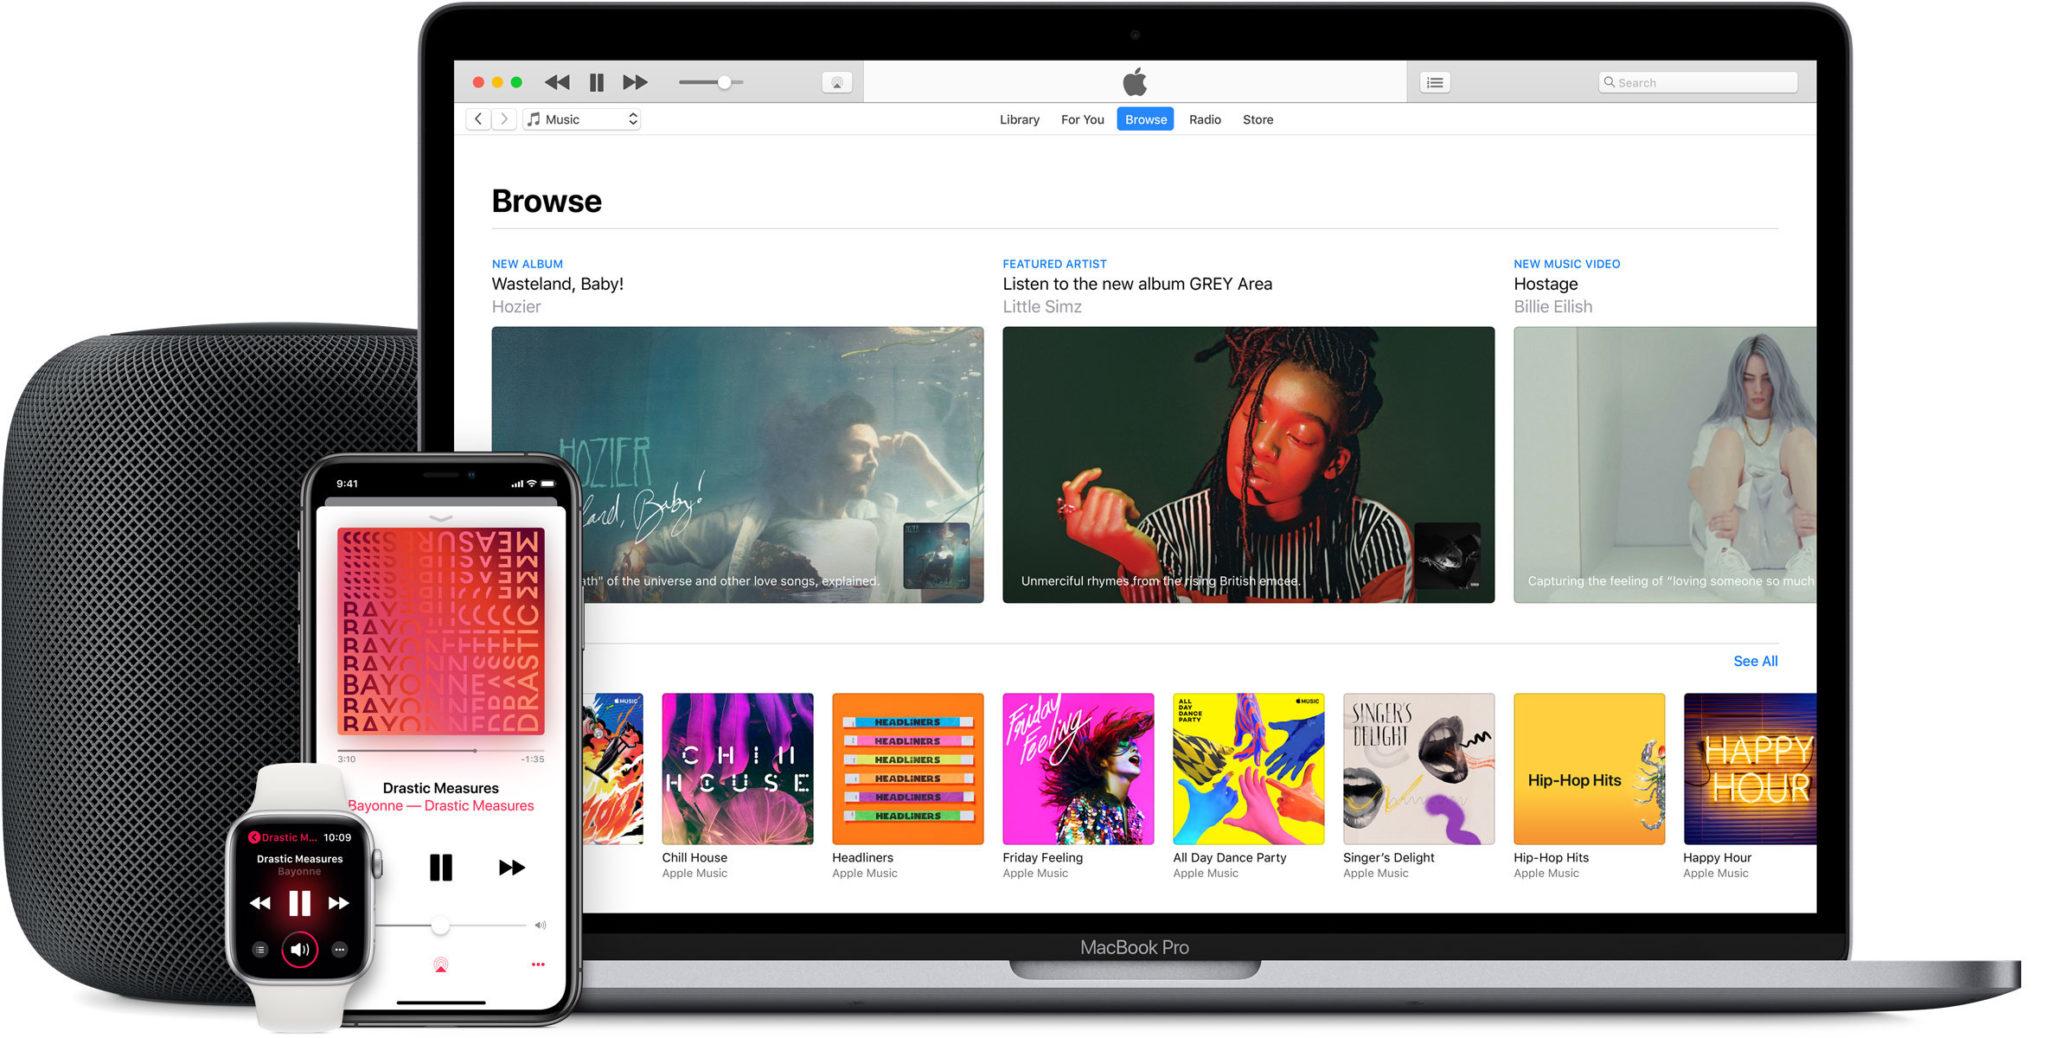 apple music hero large devices macbook iphone watch homepod - macOS 10.15 rozdelí iTunes na samostatné aplikácie – hudbu, podcasty a filmy